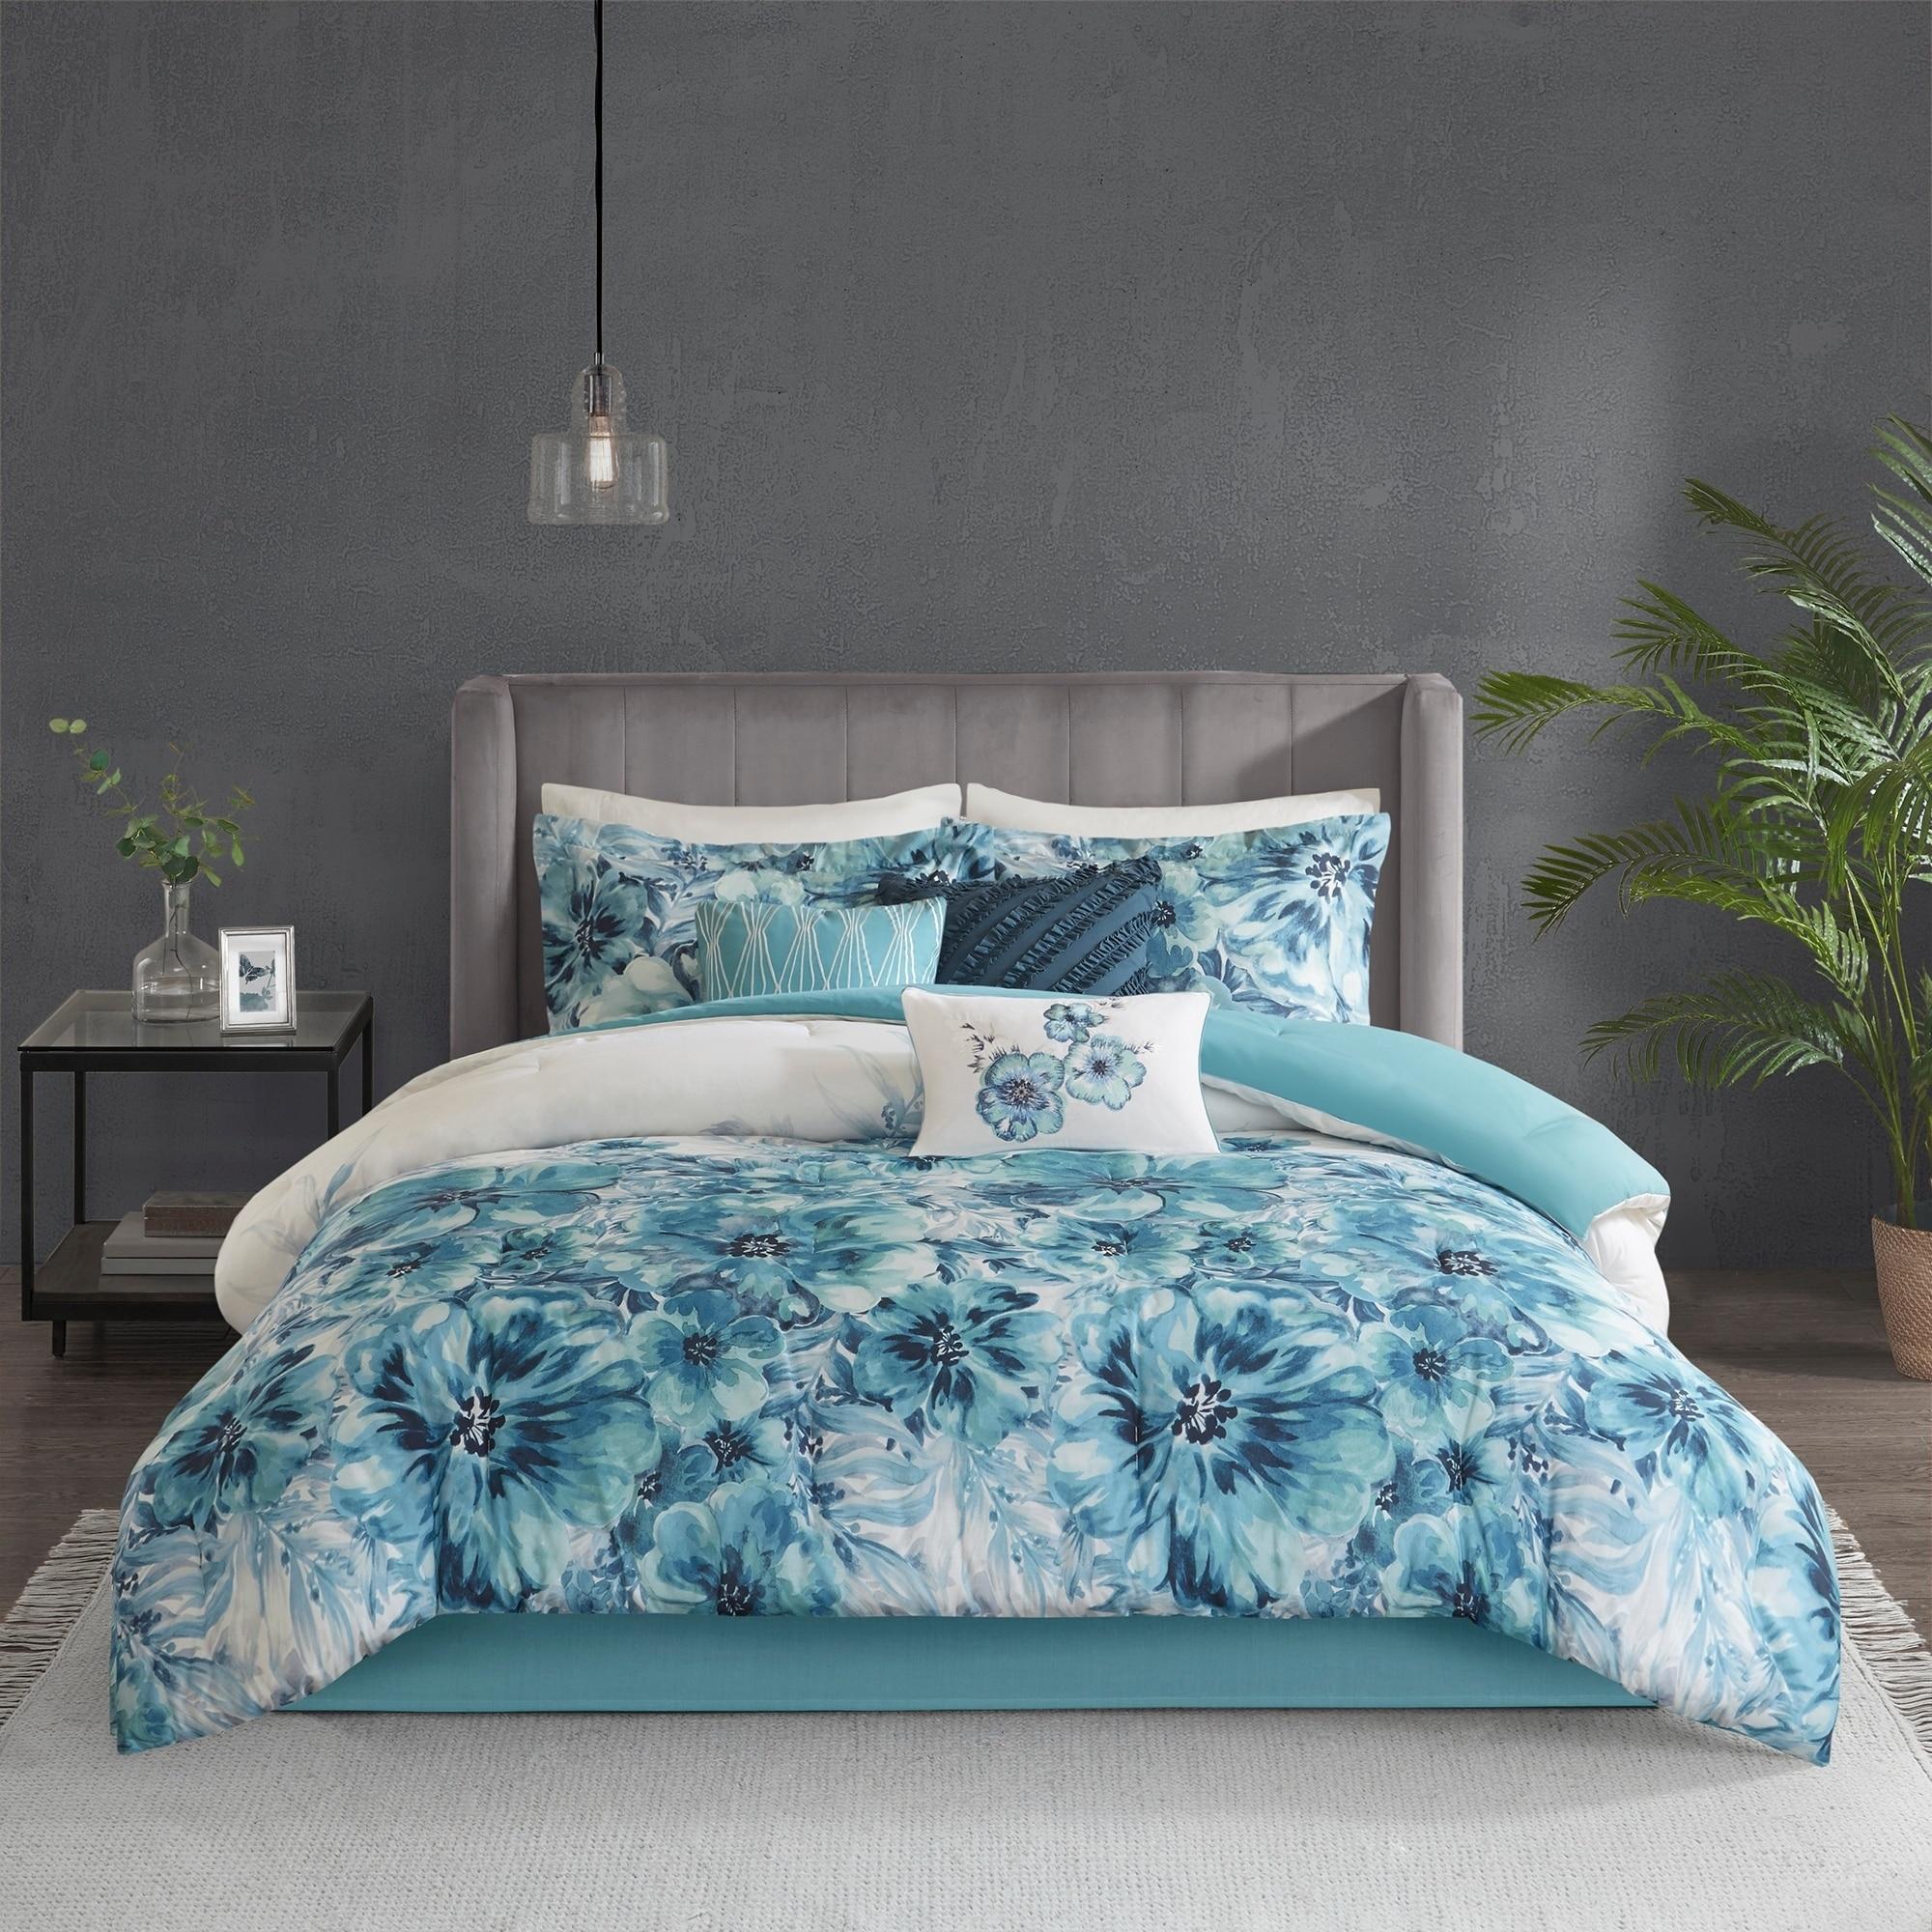 Shop Madison Park Adella Teal 7 Piece Cotton Printed Comforter Set